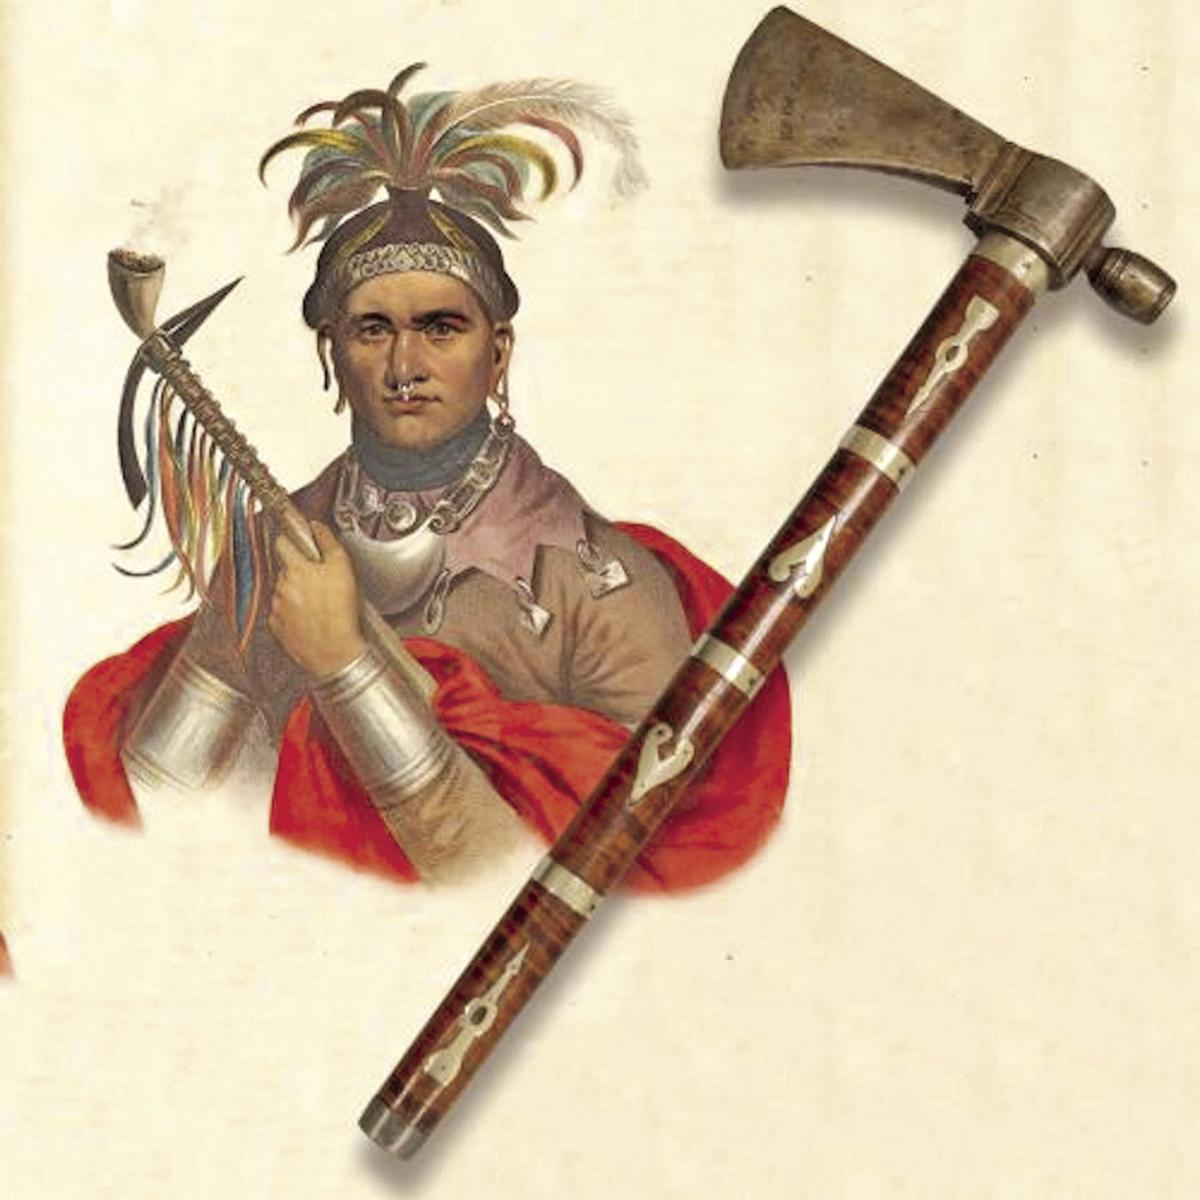 Missing Cornplanter peace pipe-tomahawk returning to Seneca